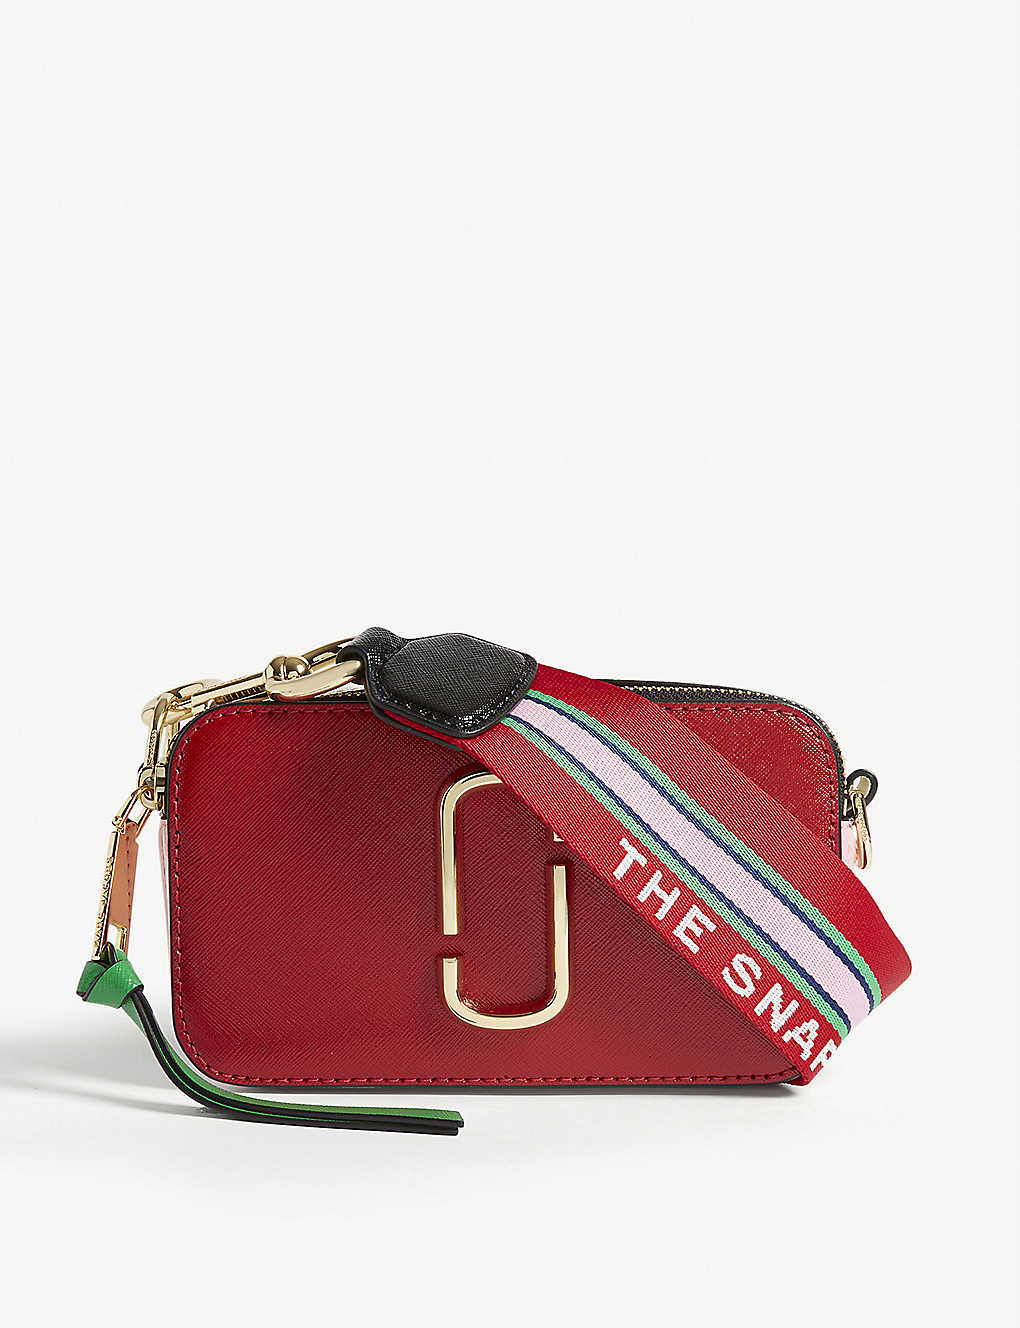 7c536b2679be1 MARC JACOBS - Snapshot bag | Selfridges.com